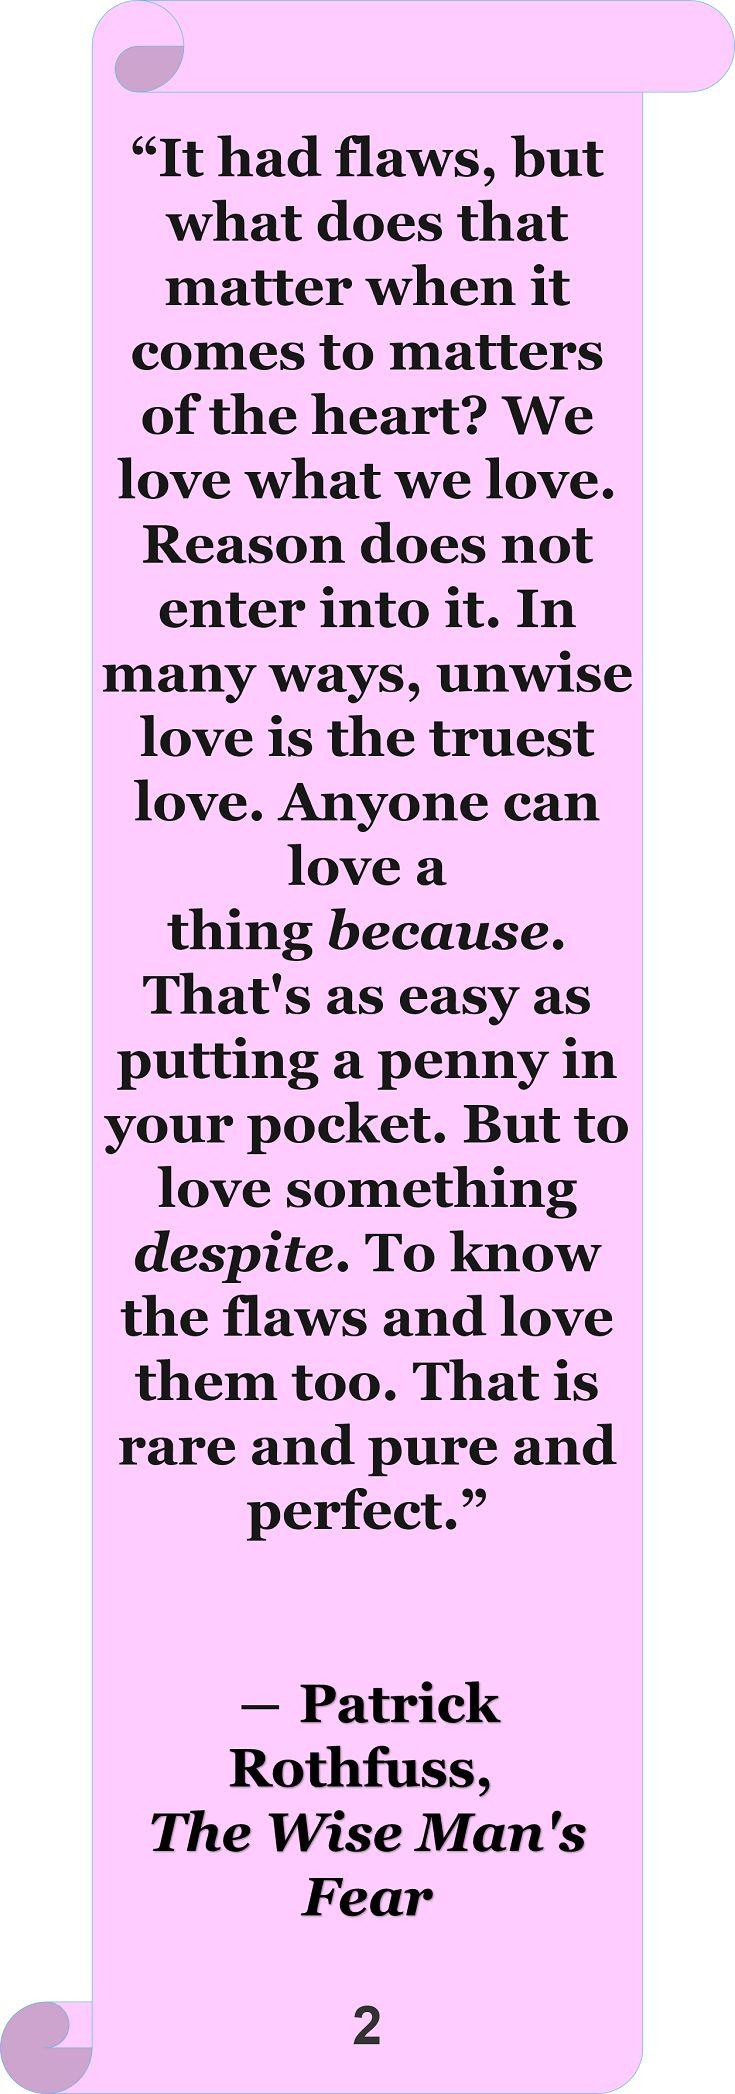 Patrick Rothfuss #Quote #Author #Love